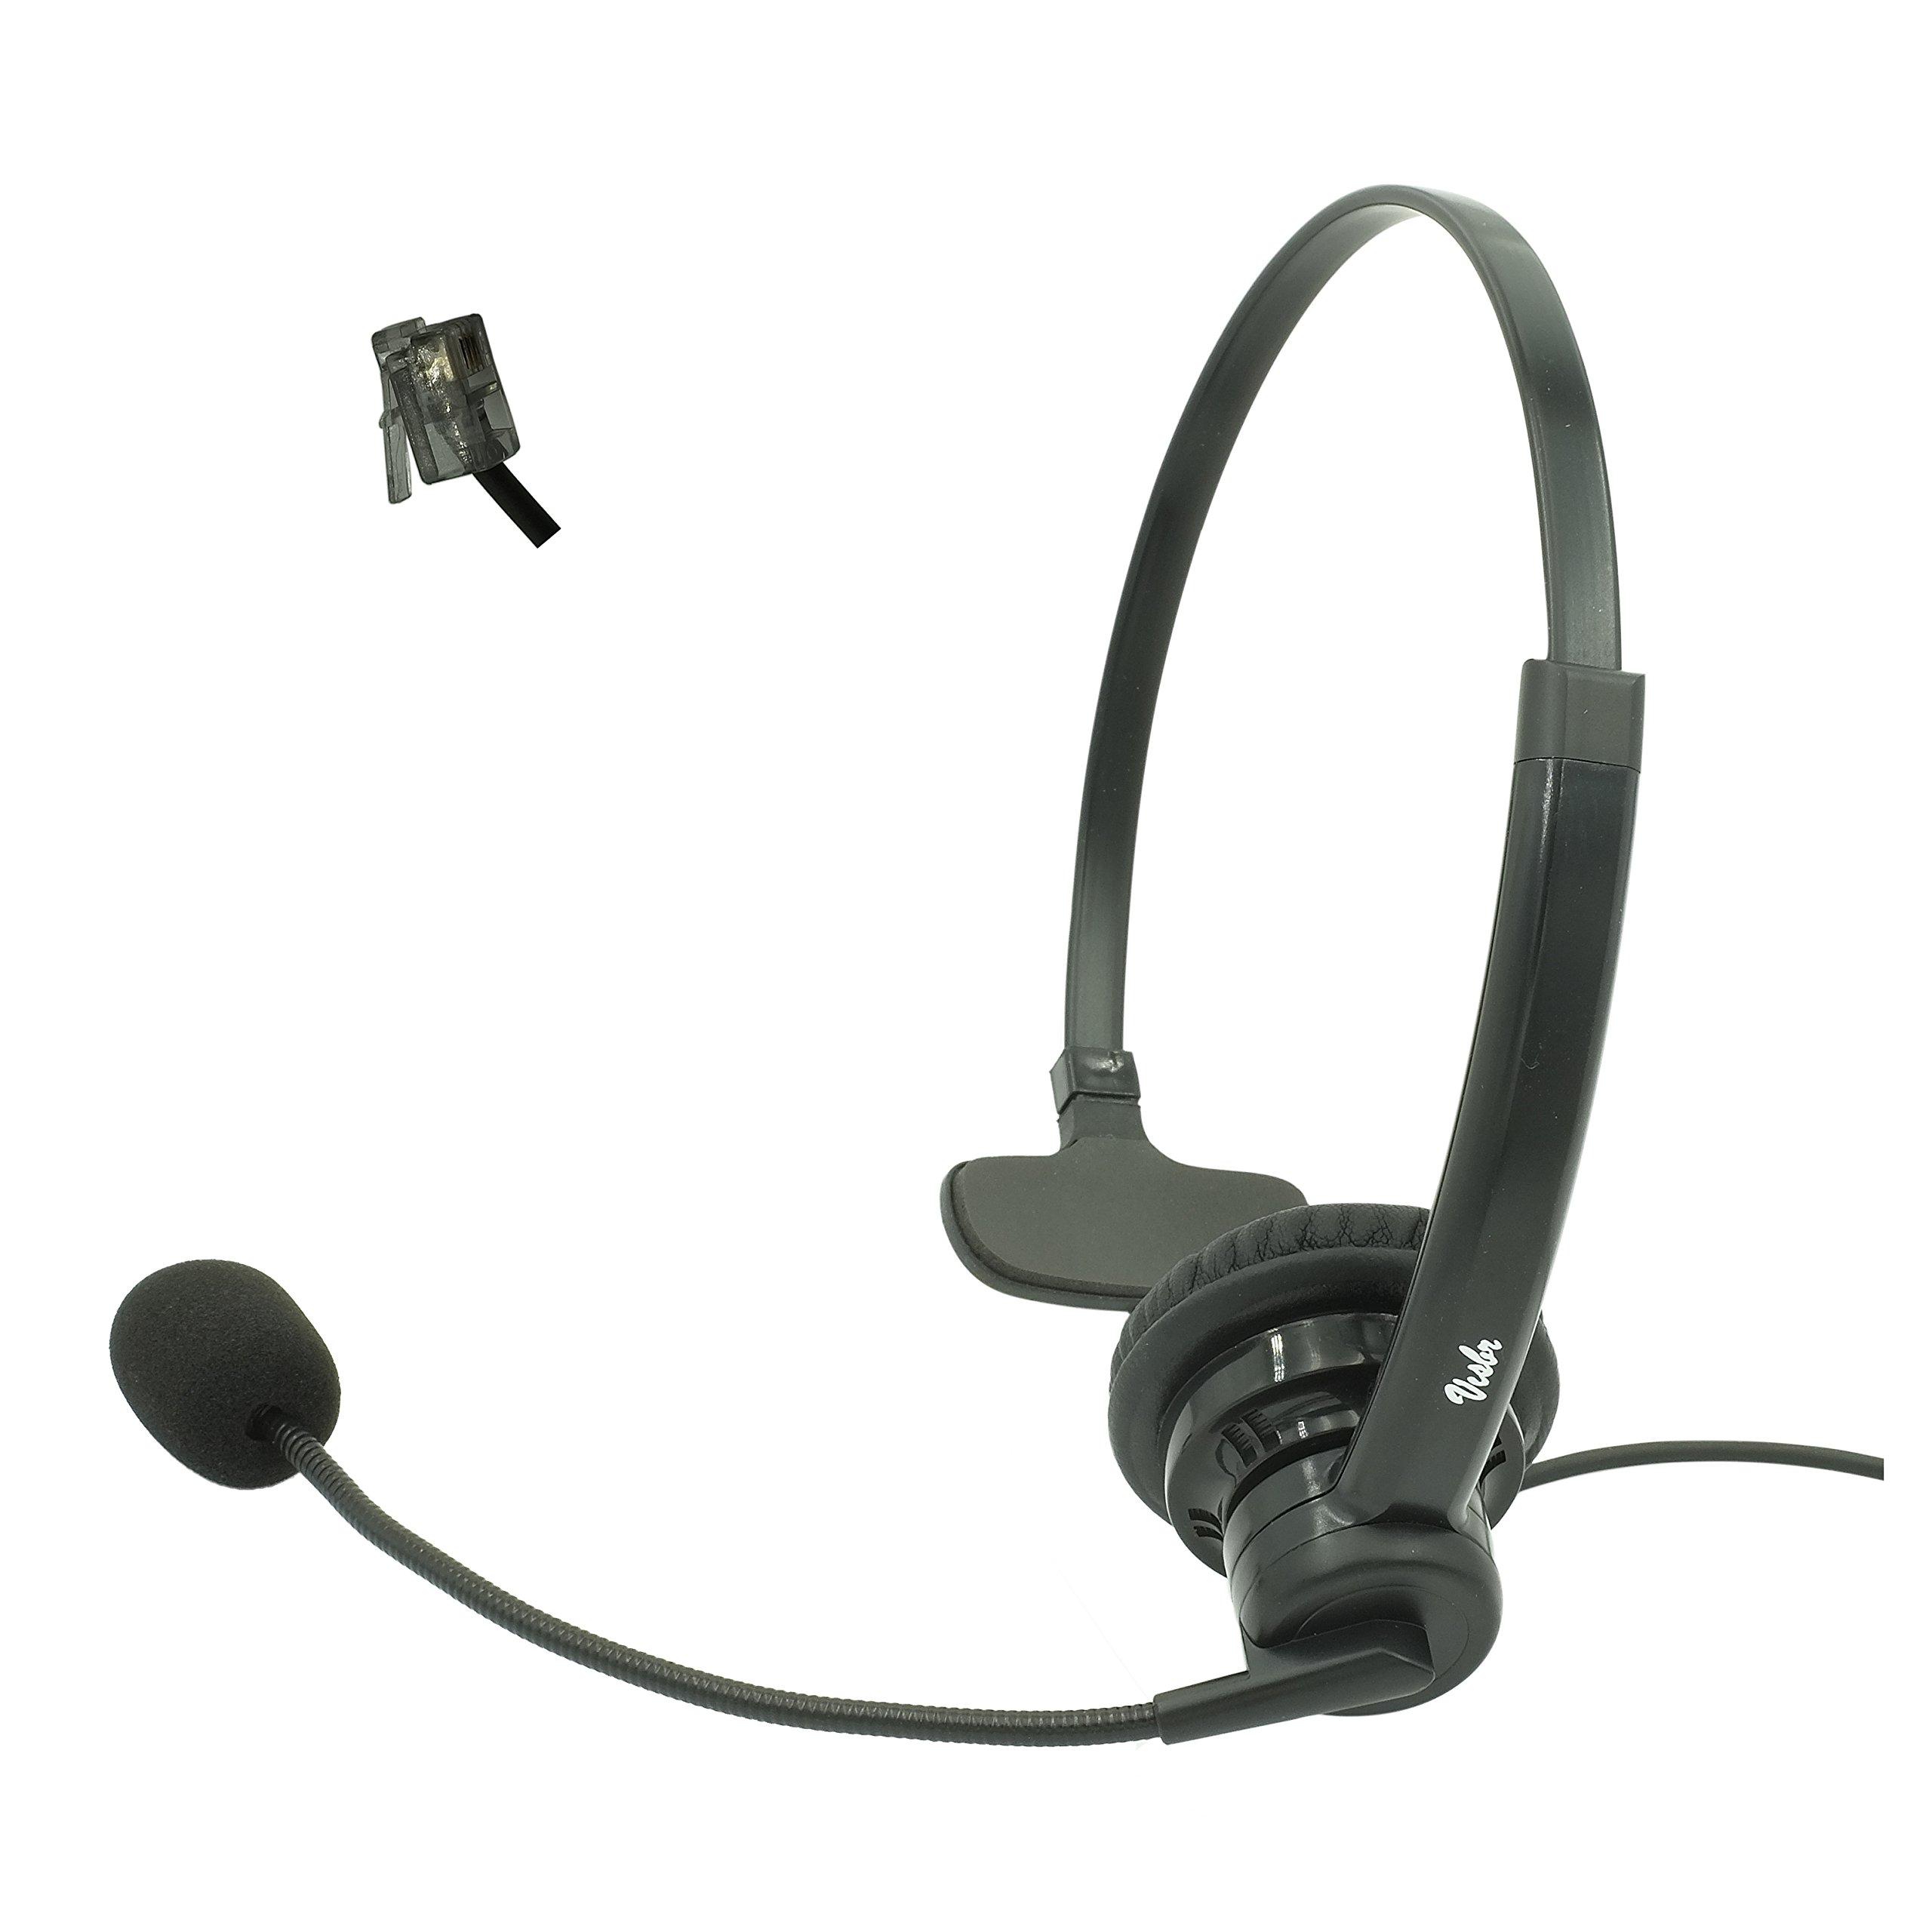 4-Pin RJ9 Monaural Headset for Most Desk Top Phones with RJ9 Headset Jack | Noise Canceling Office Headset | Business Headset | Compatible phone brands: Avaya Cisco Mitel Yealink Shoretel Grandstream